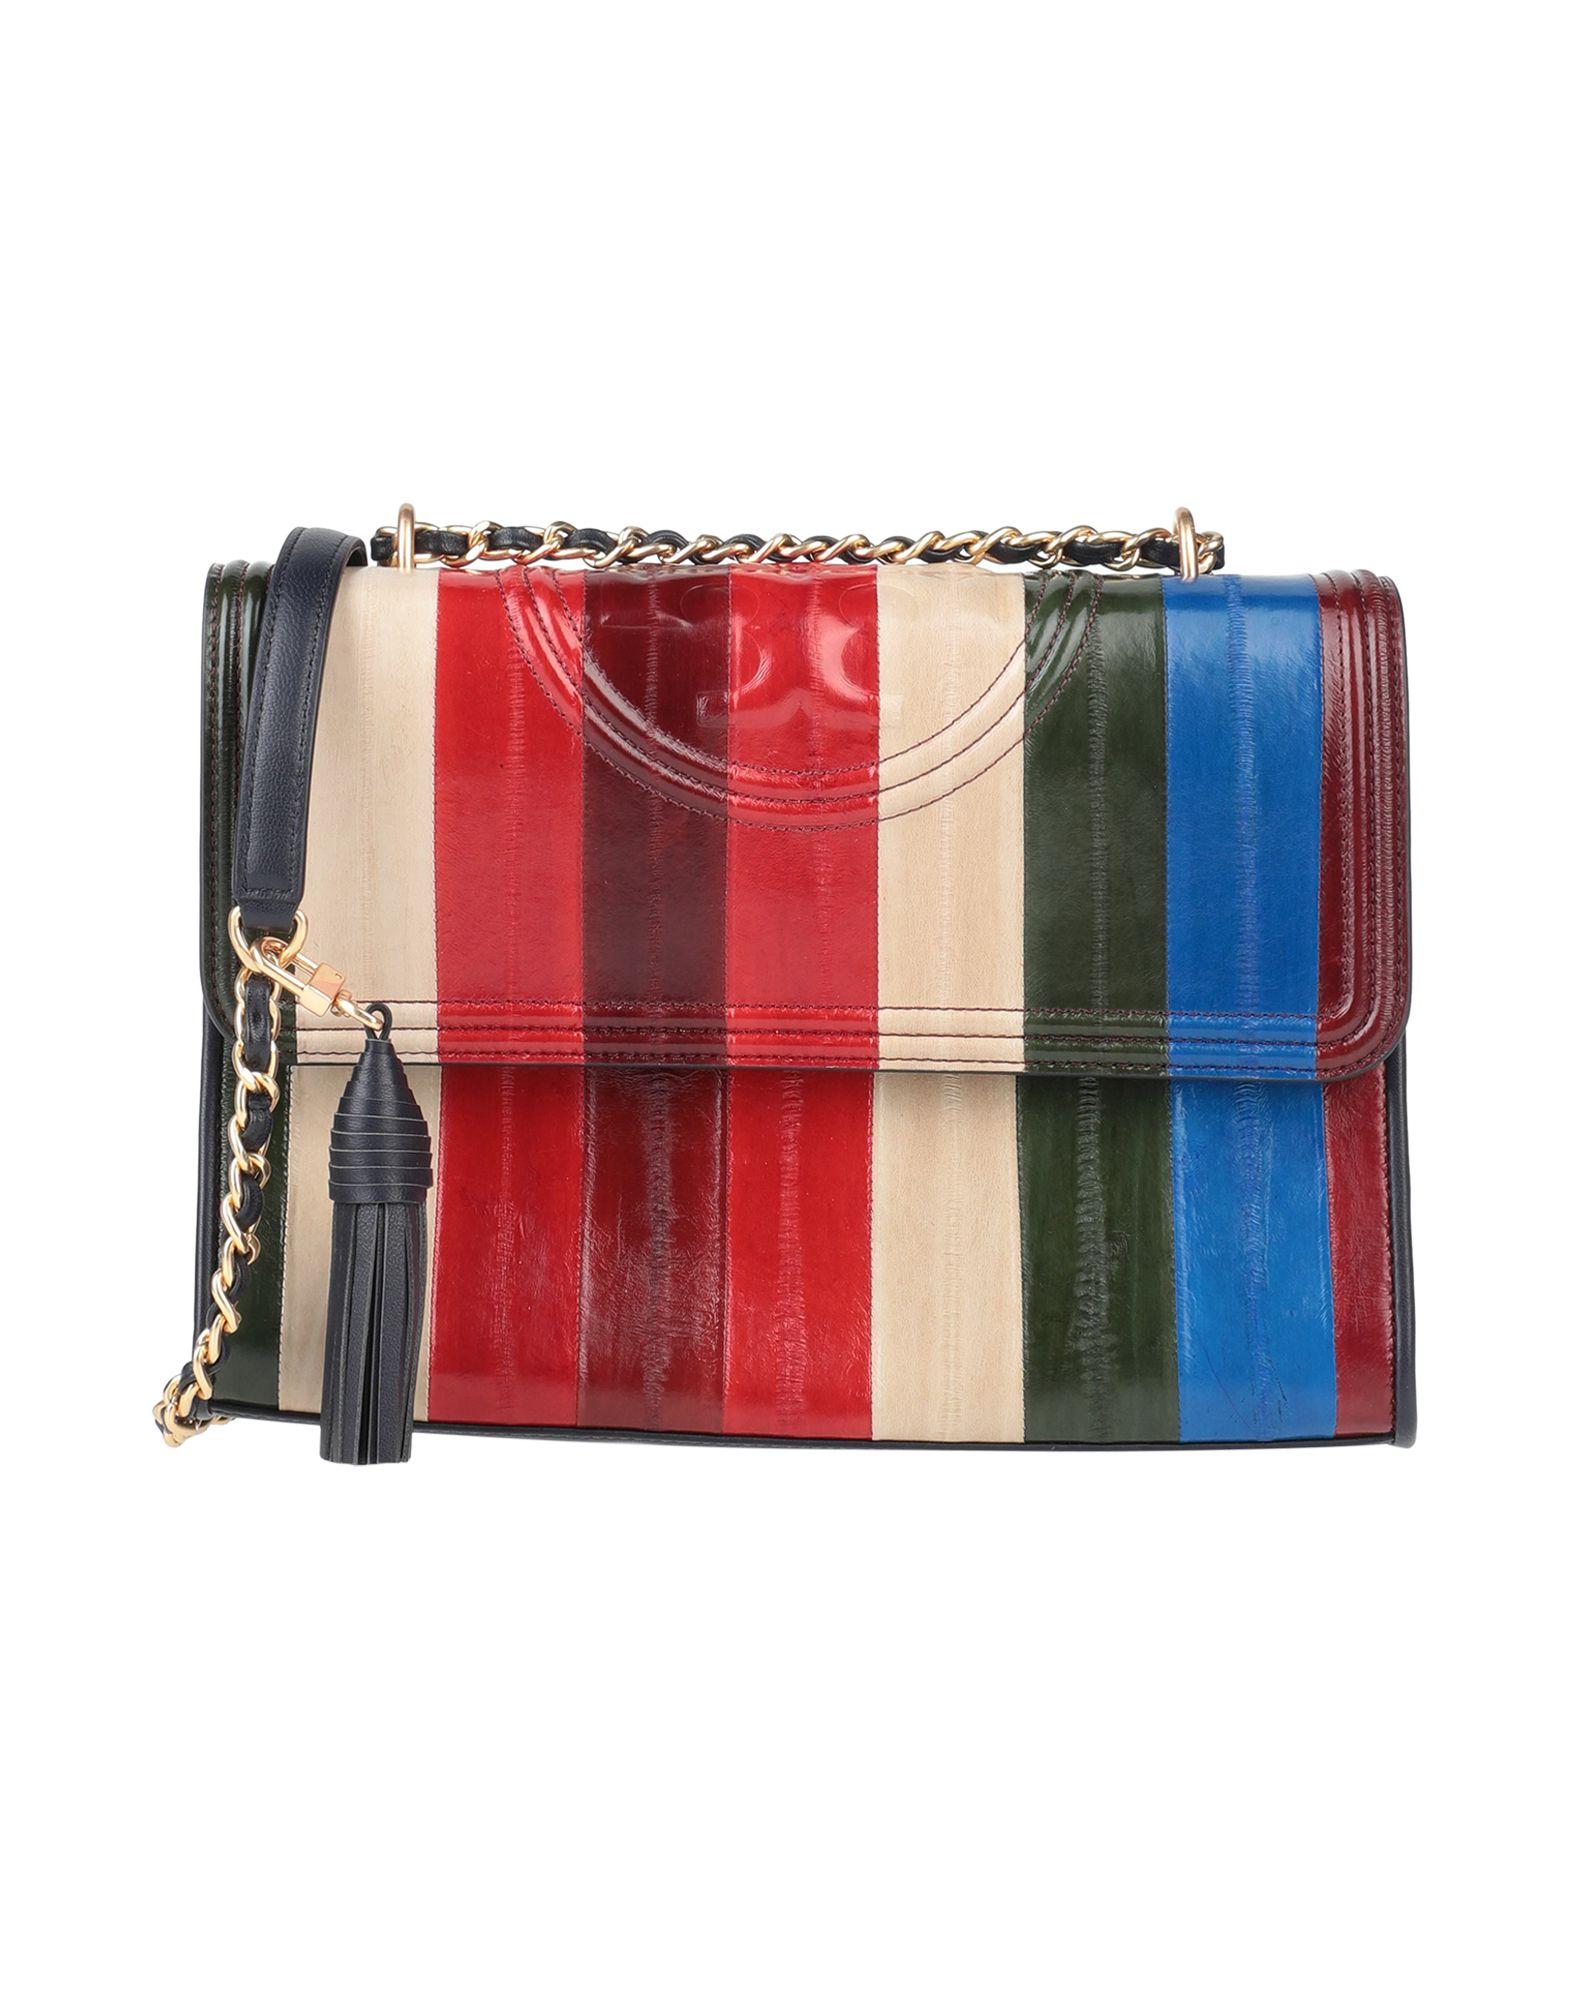 TORY BURCH Cross-body bags - Item 45527261